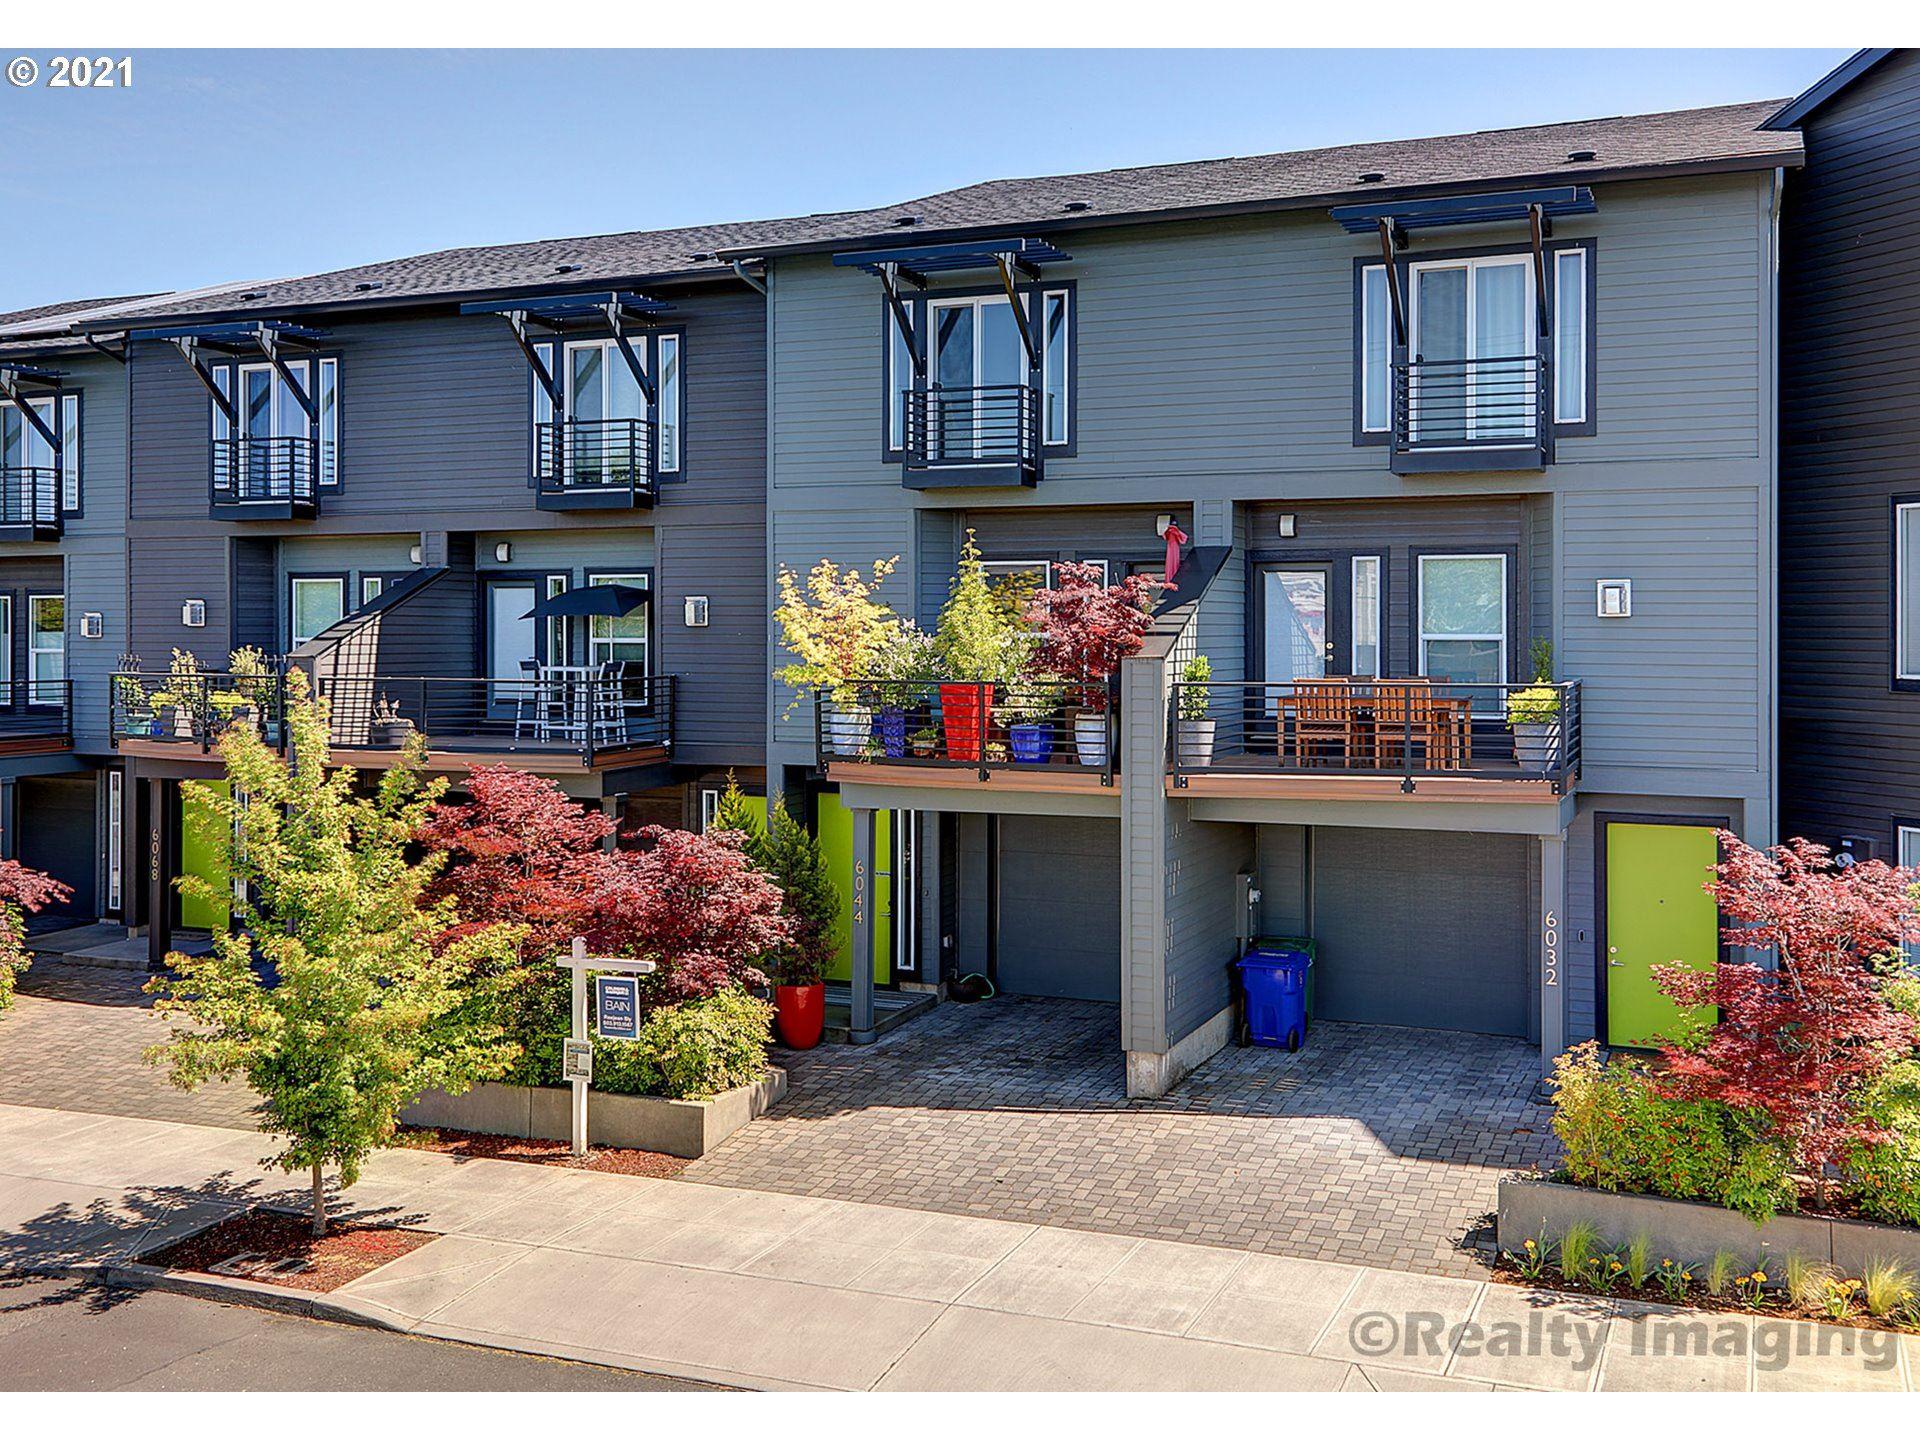 6044 NE GRAND AVE, Portland, OR 97211 - MLS#: 21495832